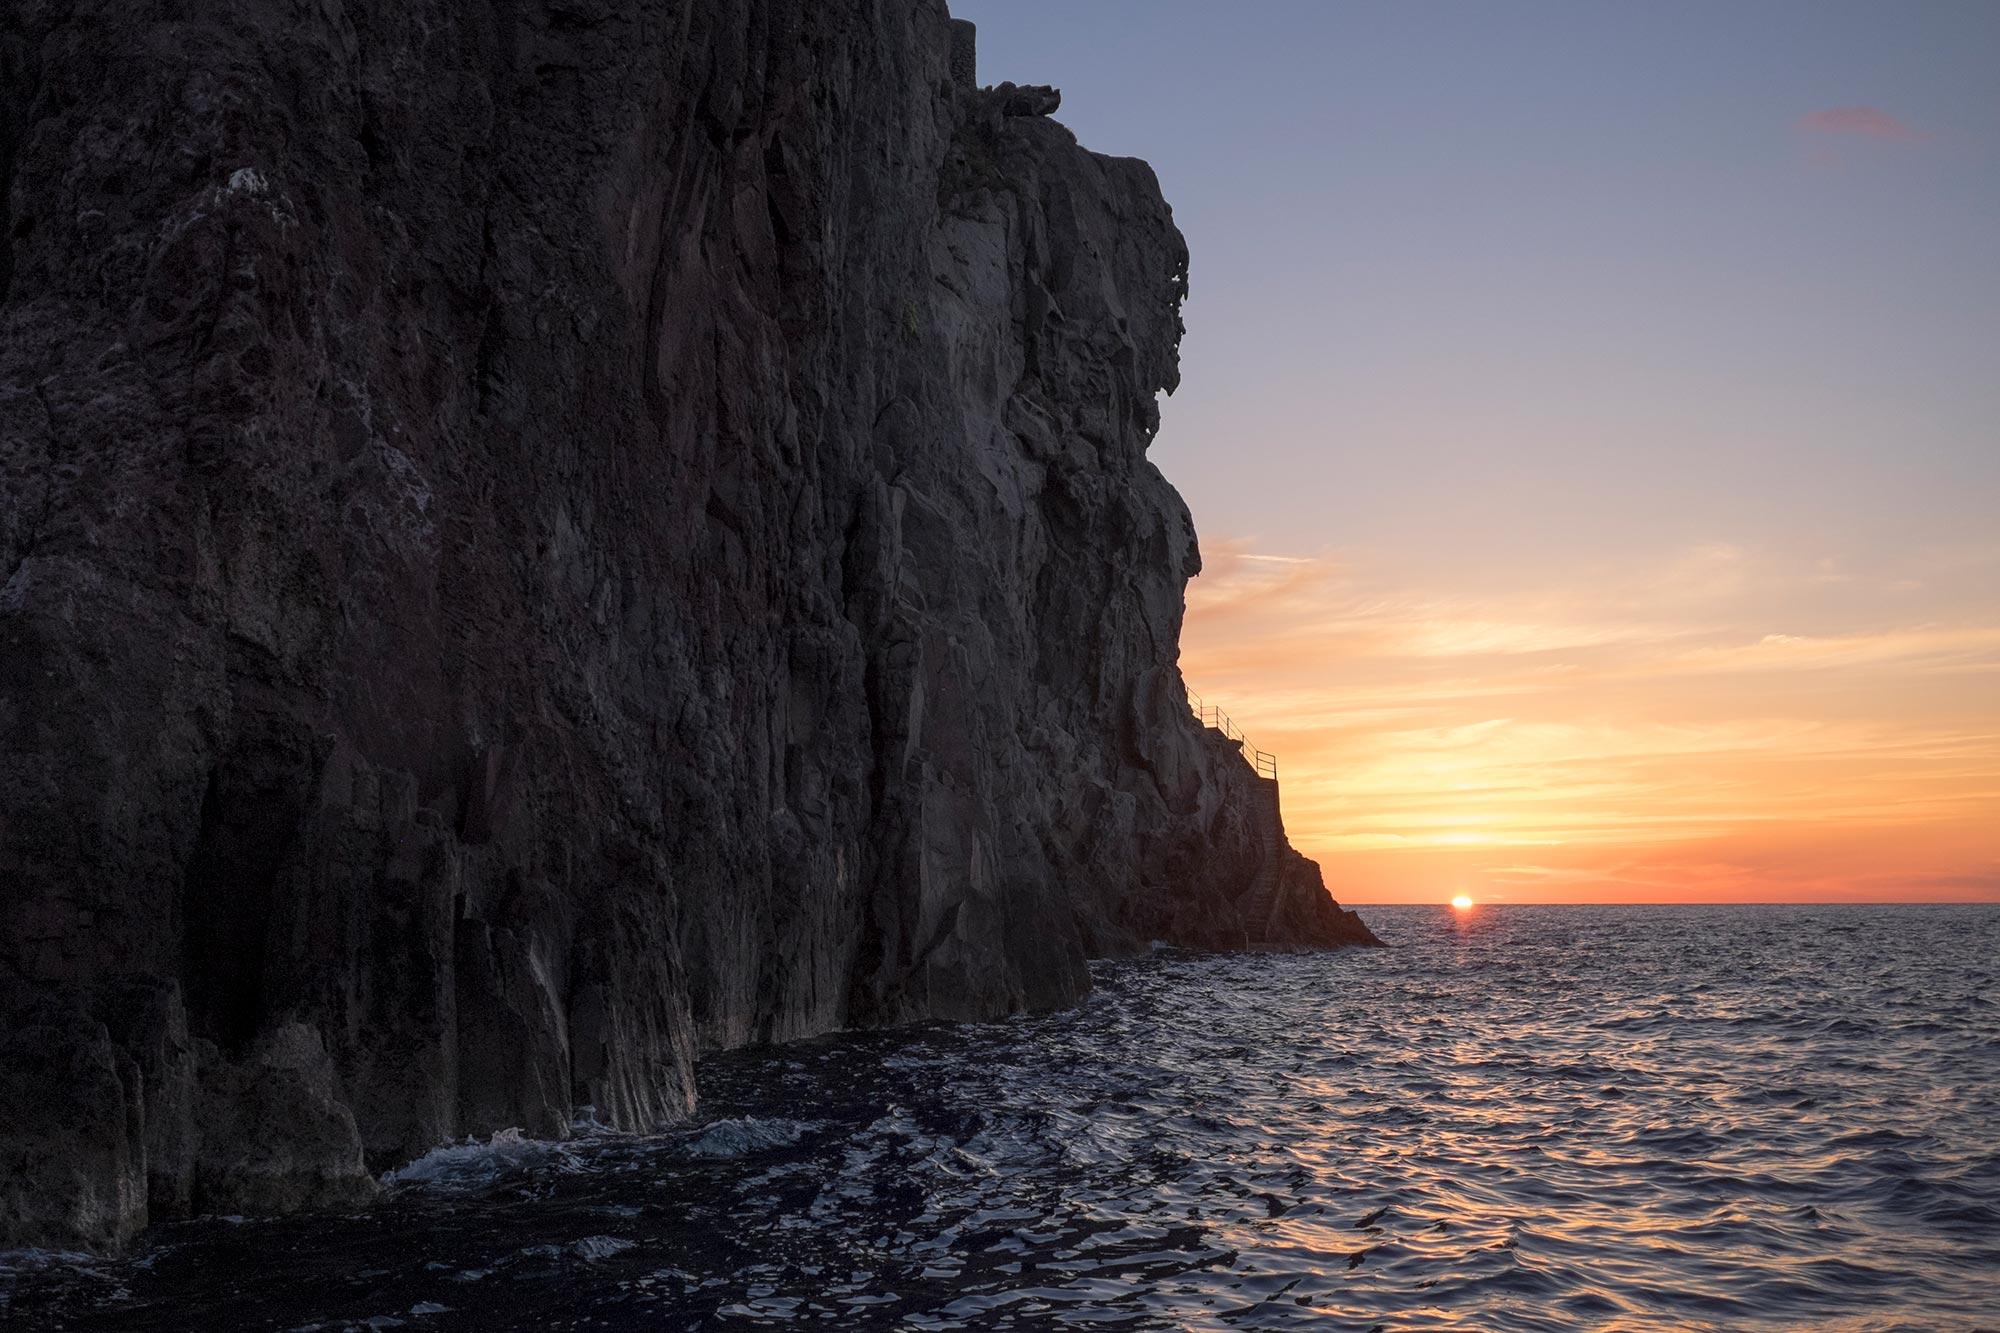 italy-sicilia-eolie-strombolicchio-sunset1